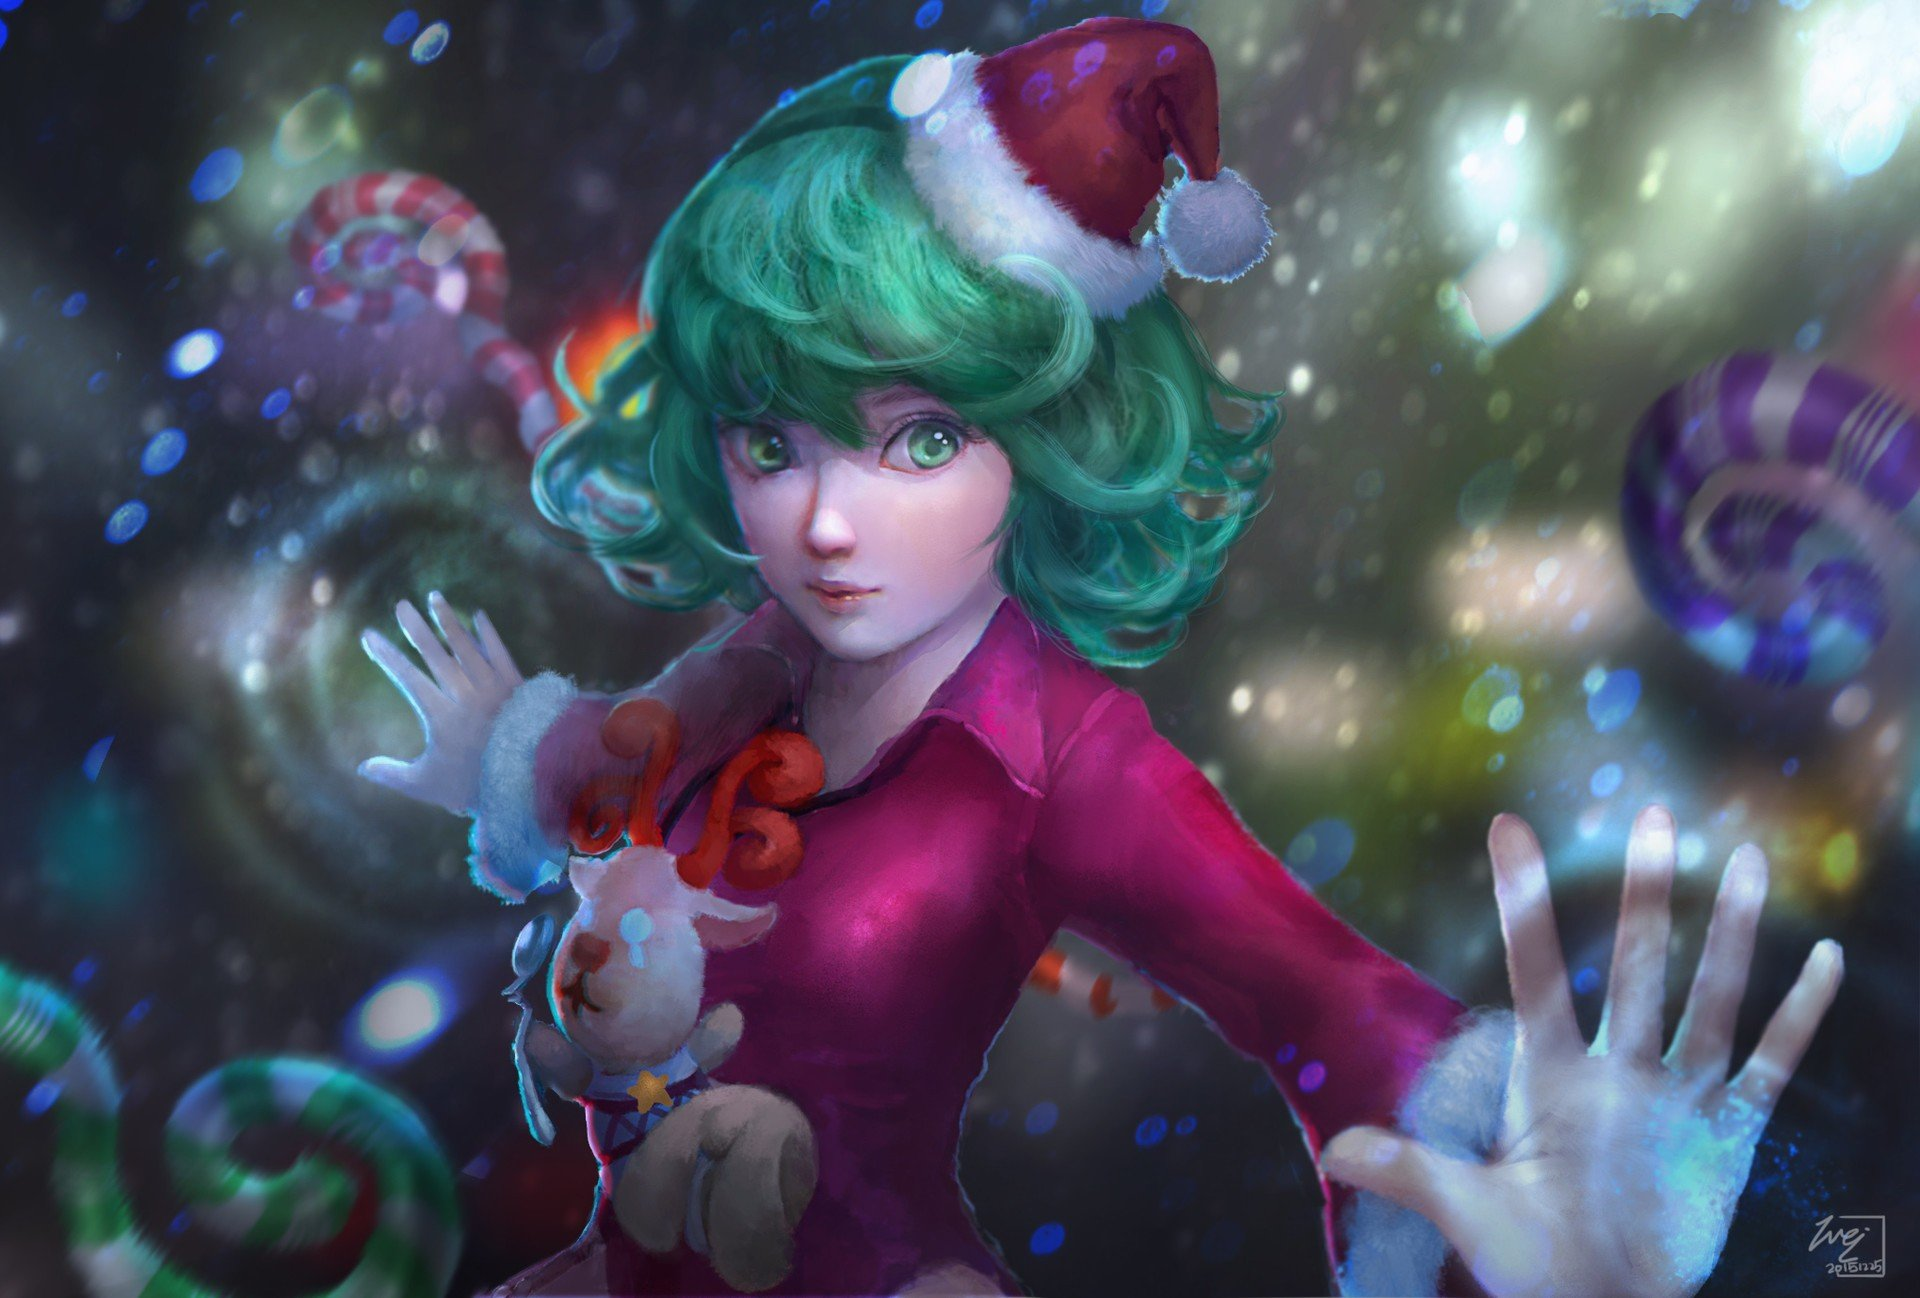 Magic One Punch Man Christmas Tatsumaki Hd Wallpapers Desktop